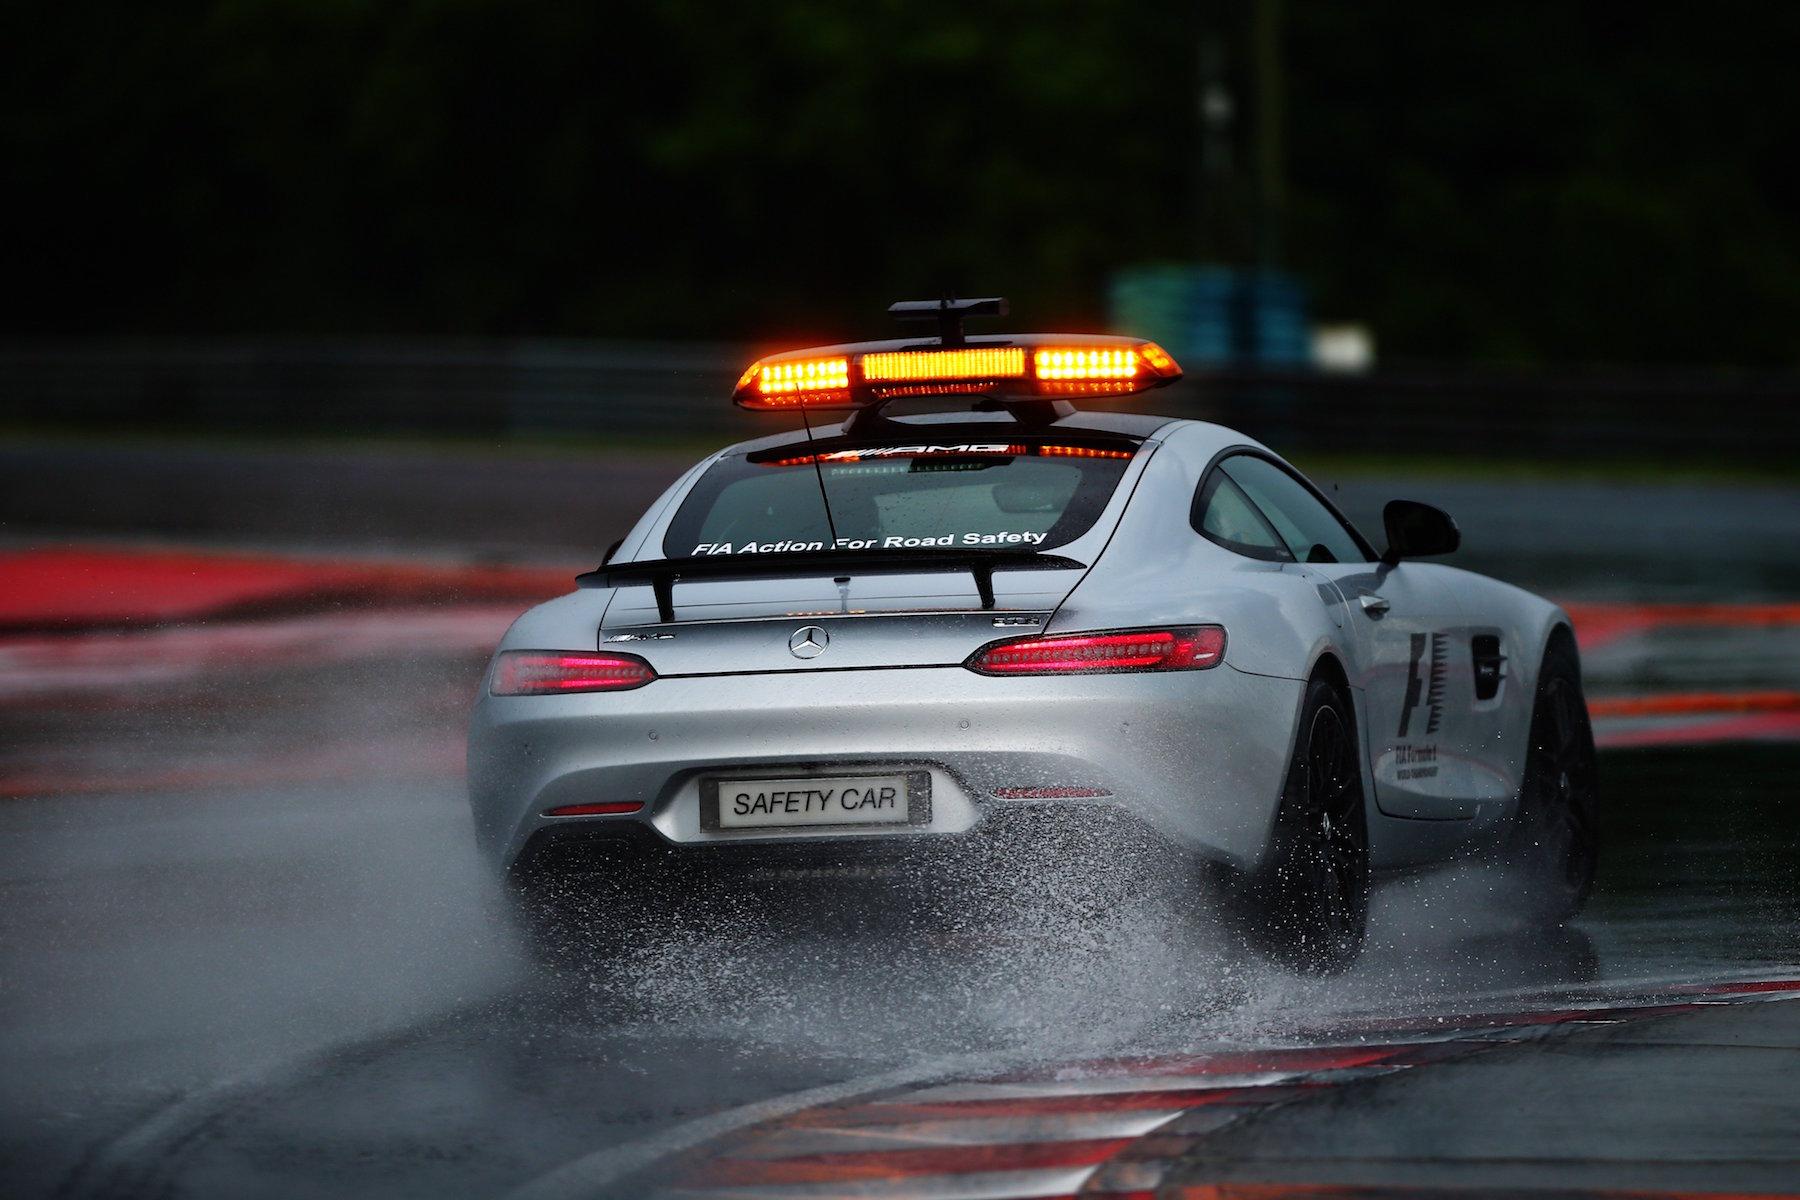 Salracing | FIA Safety Car